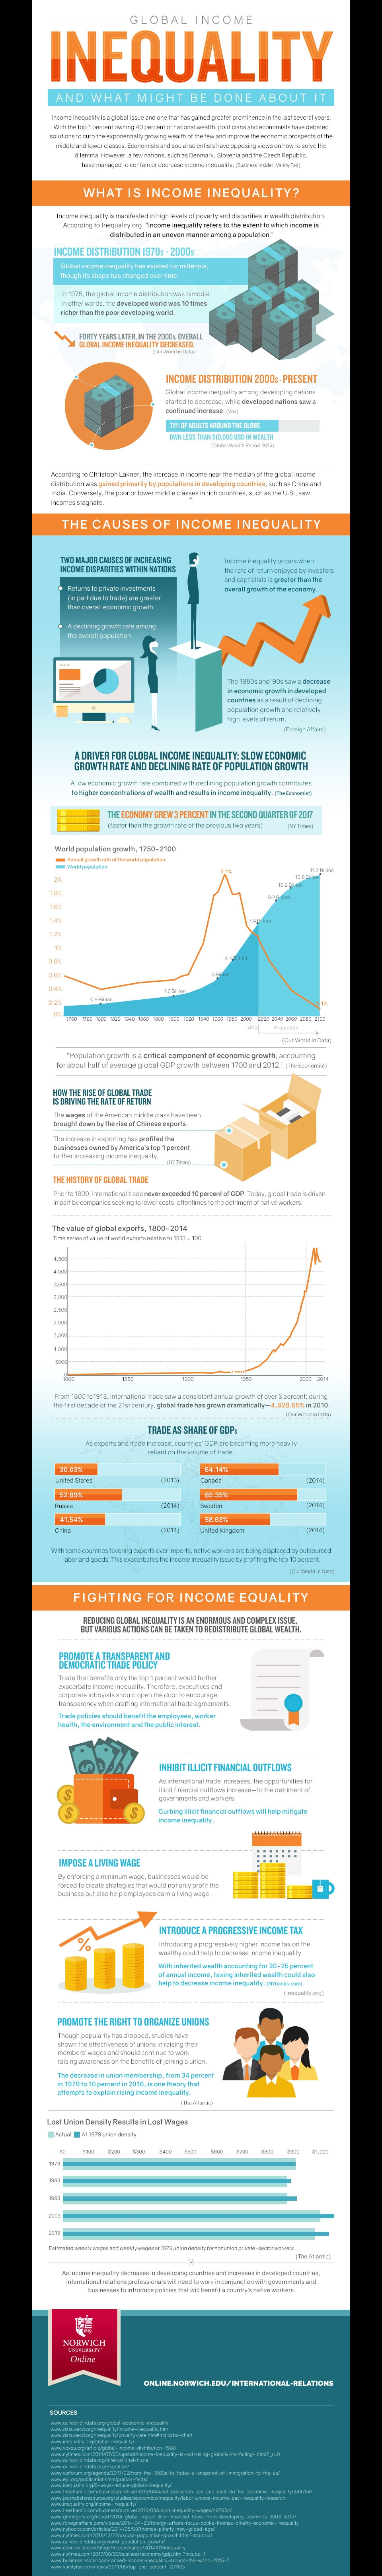 global economic inequality infographic image